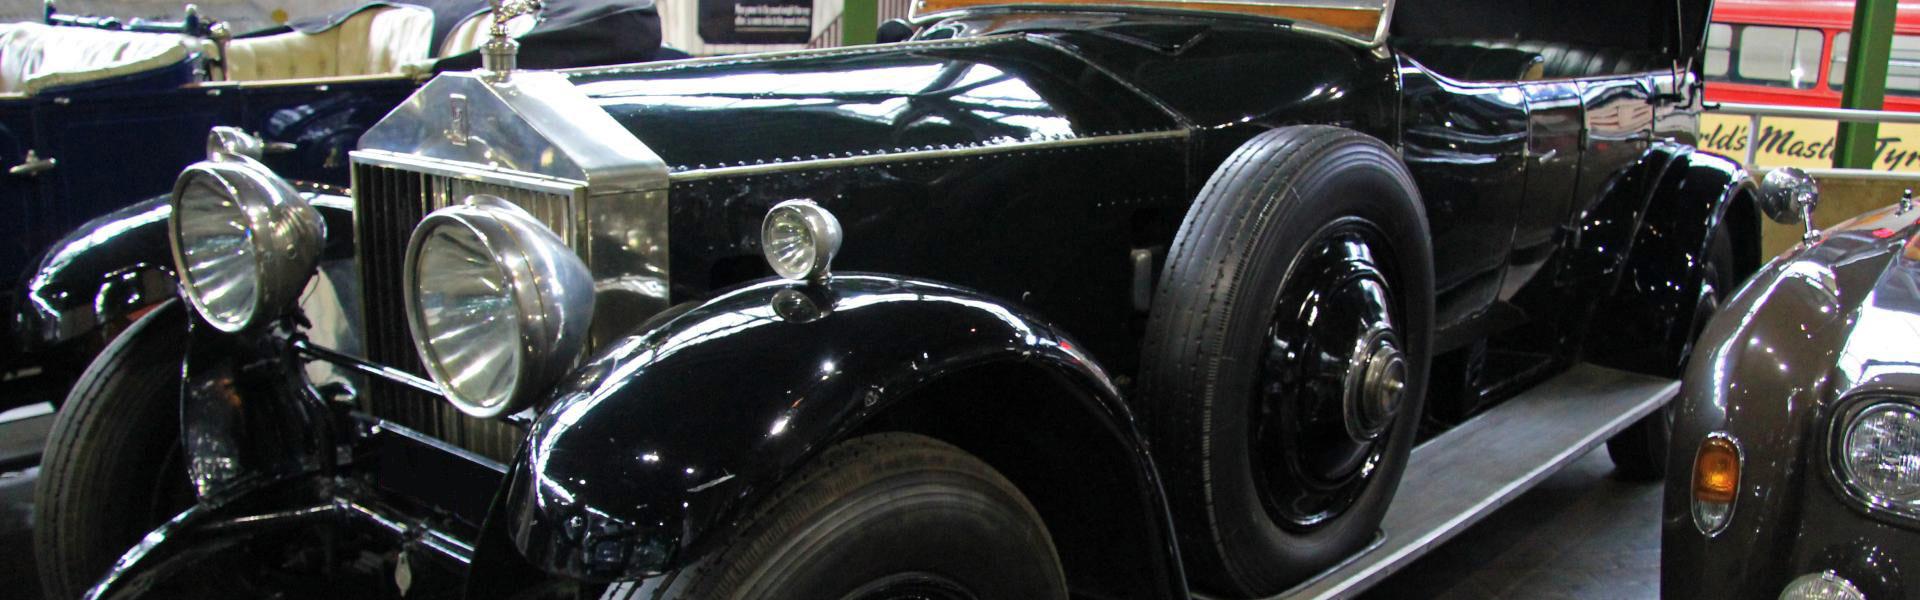 Silver Ghost restoration finance